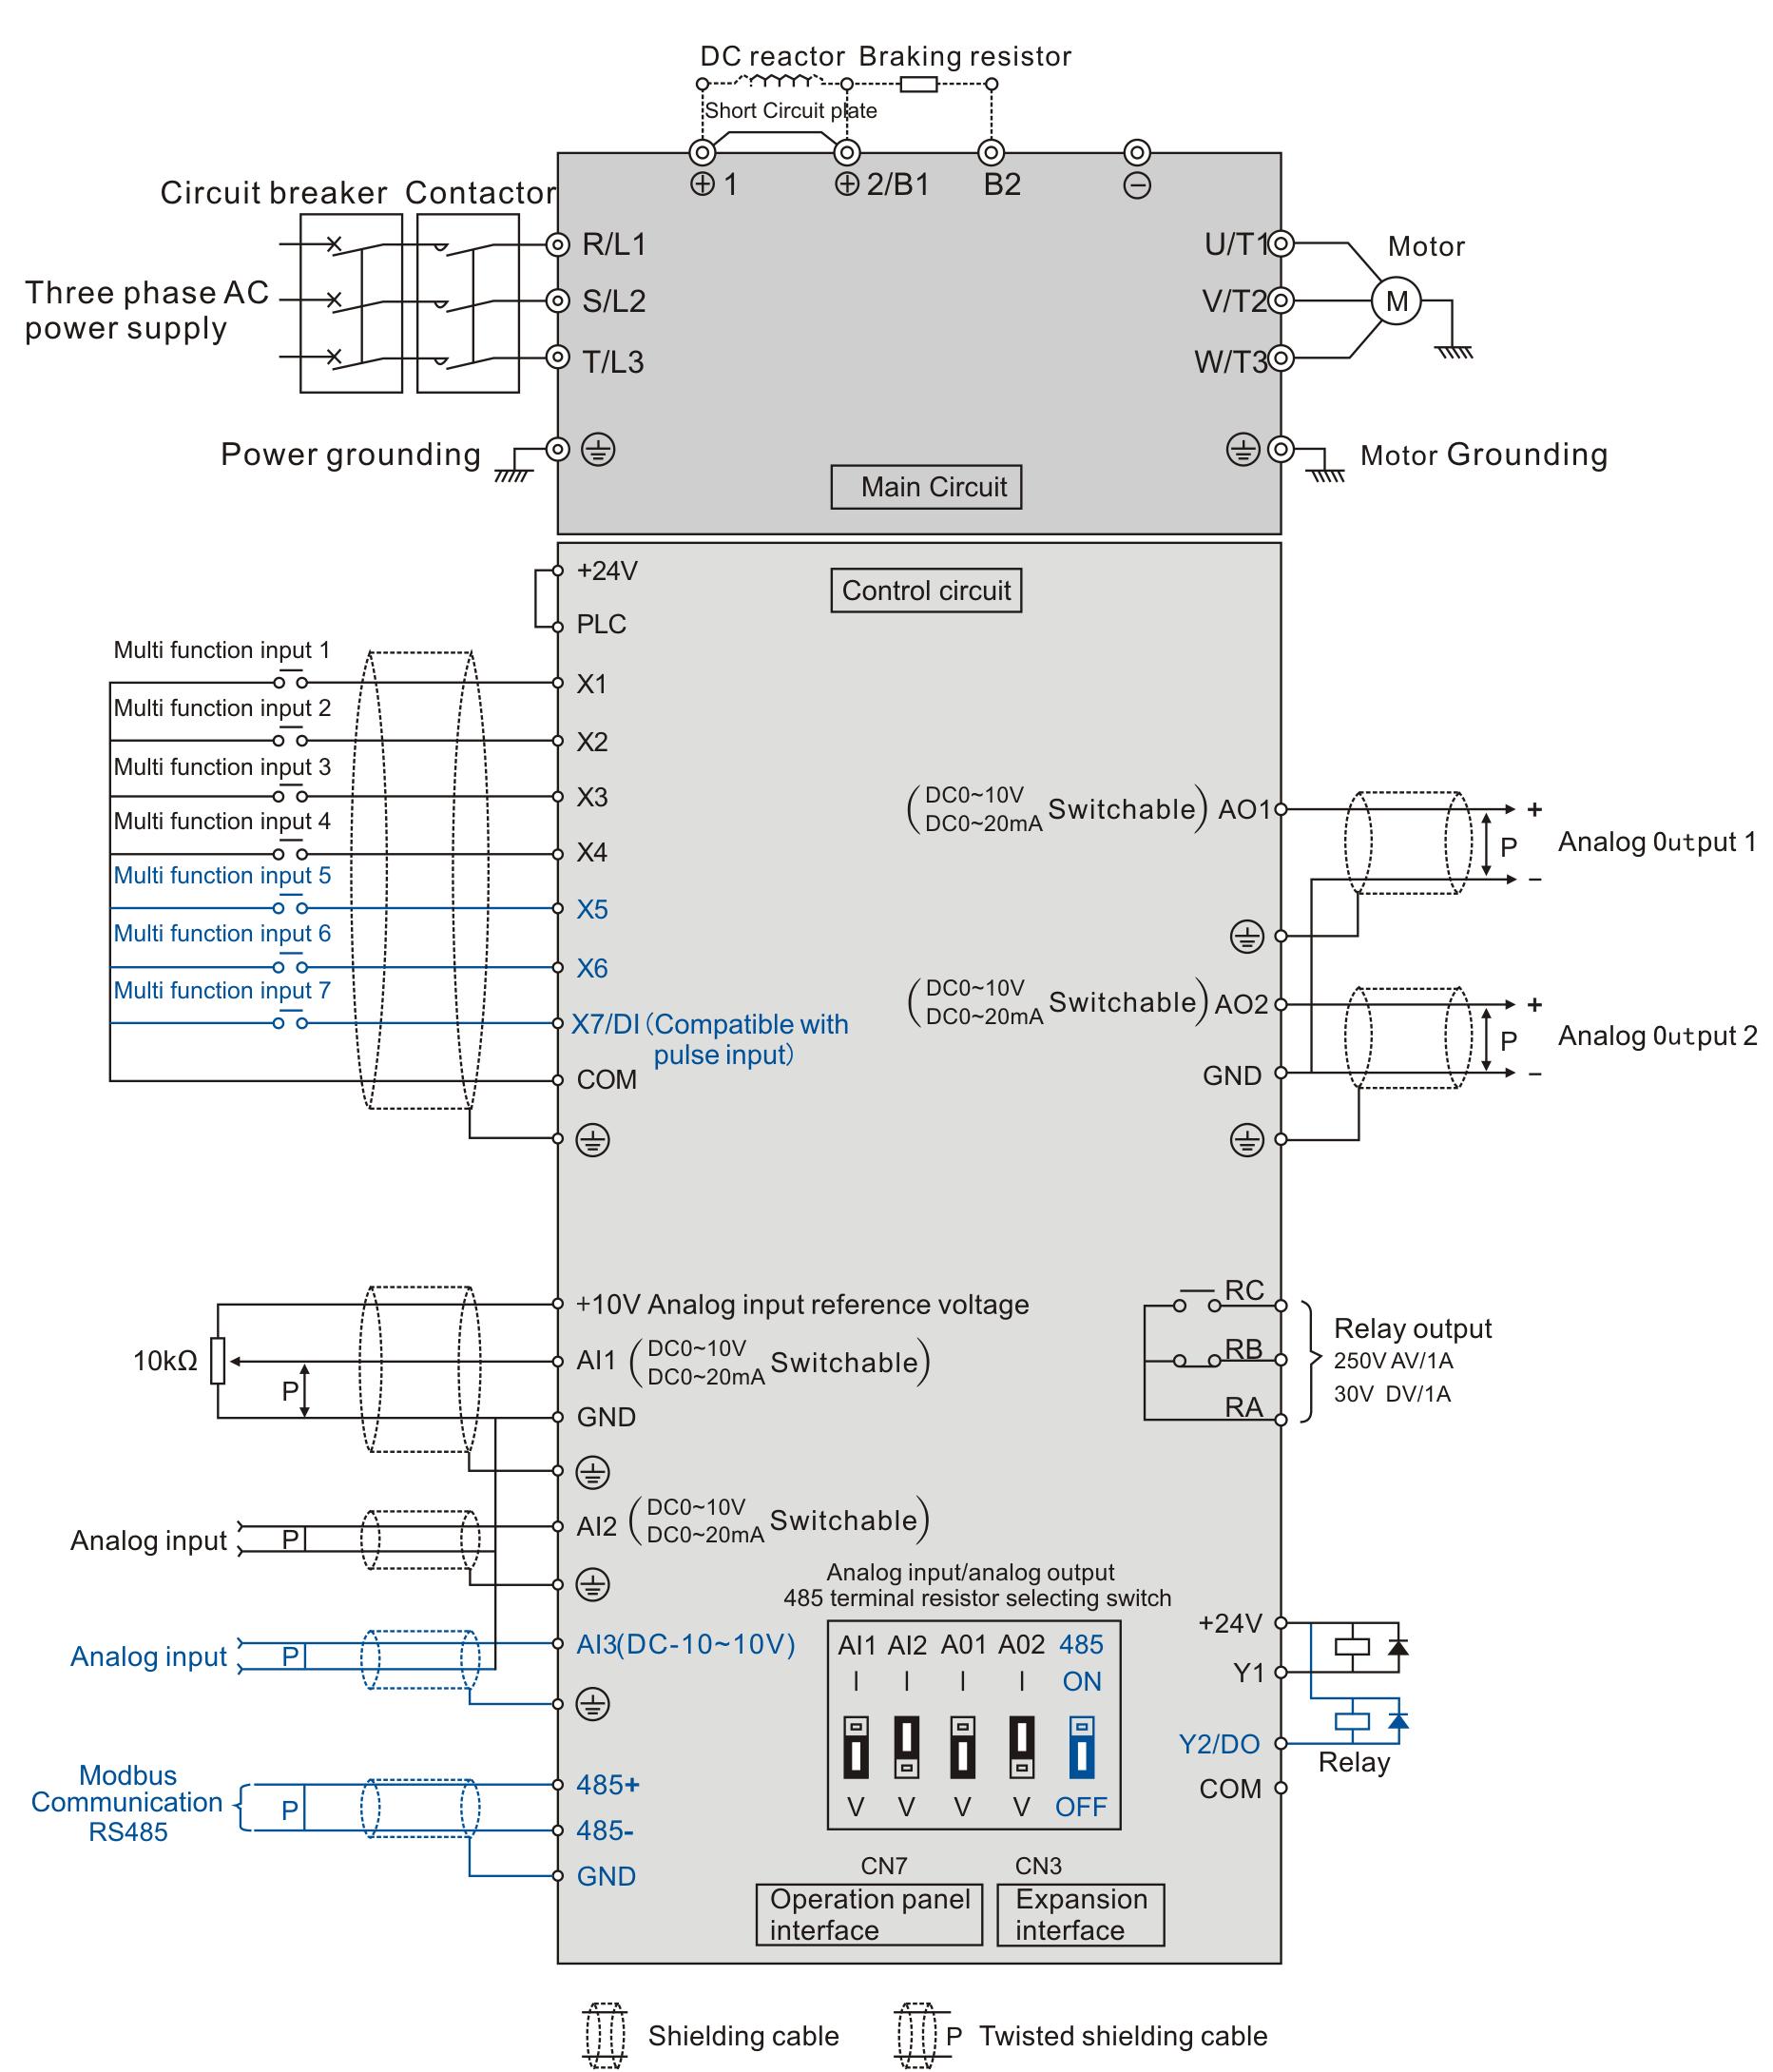 VY-JY Terminal wiring.png